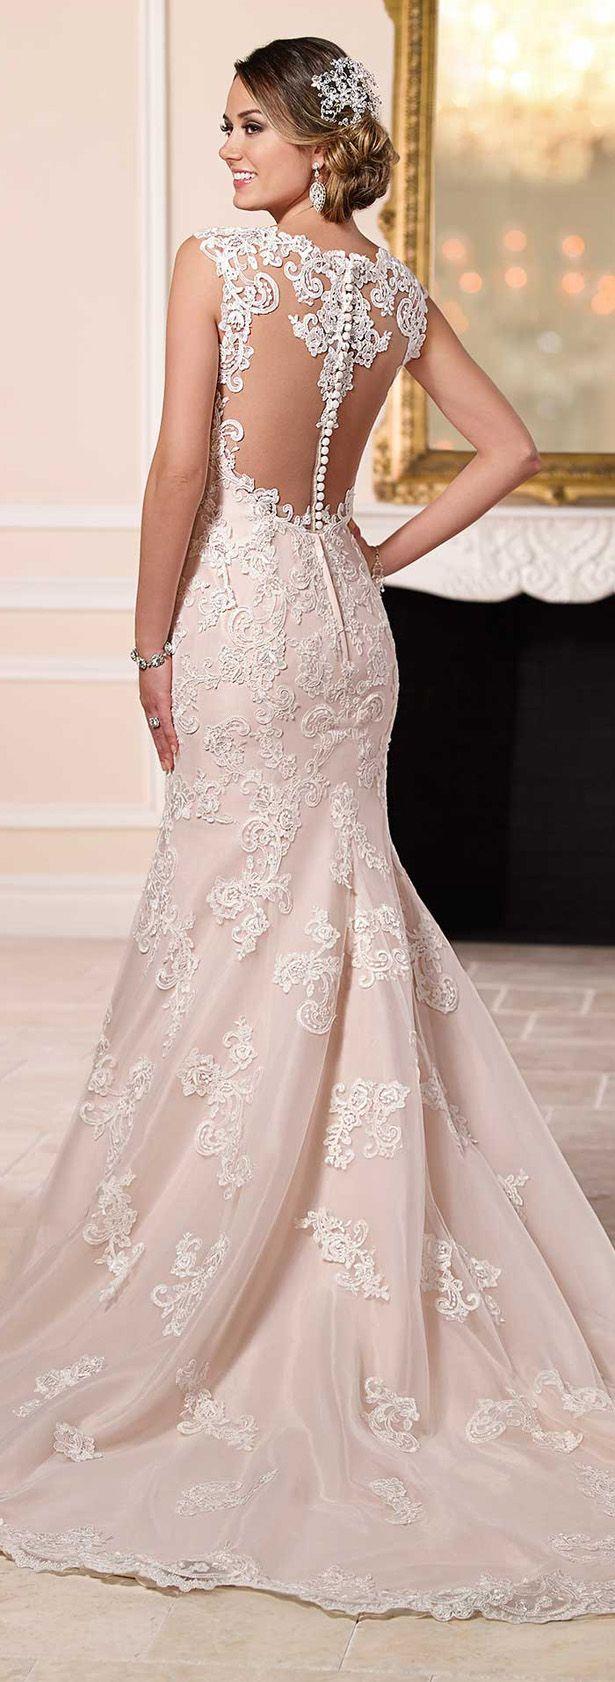 Best wedding dresses for under 1000   best Wedding dresses images on Pinterest  Gown wedding Bridal